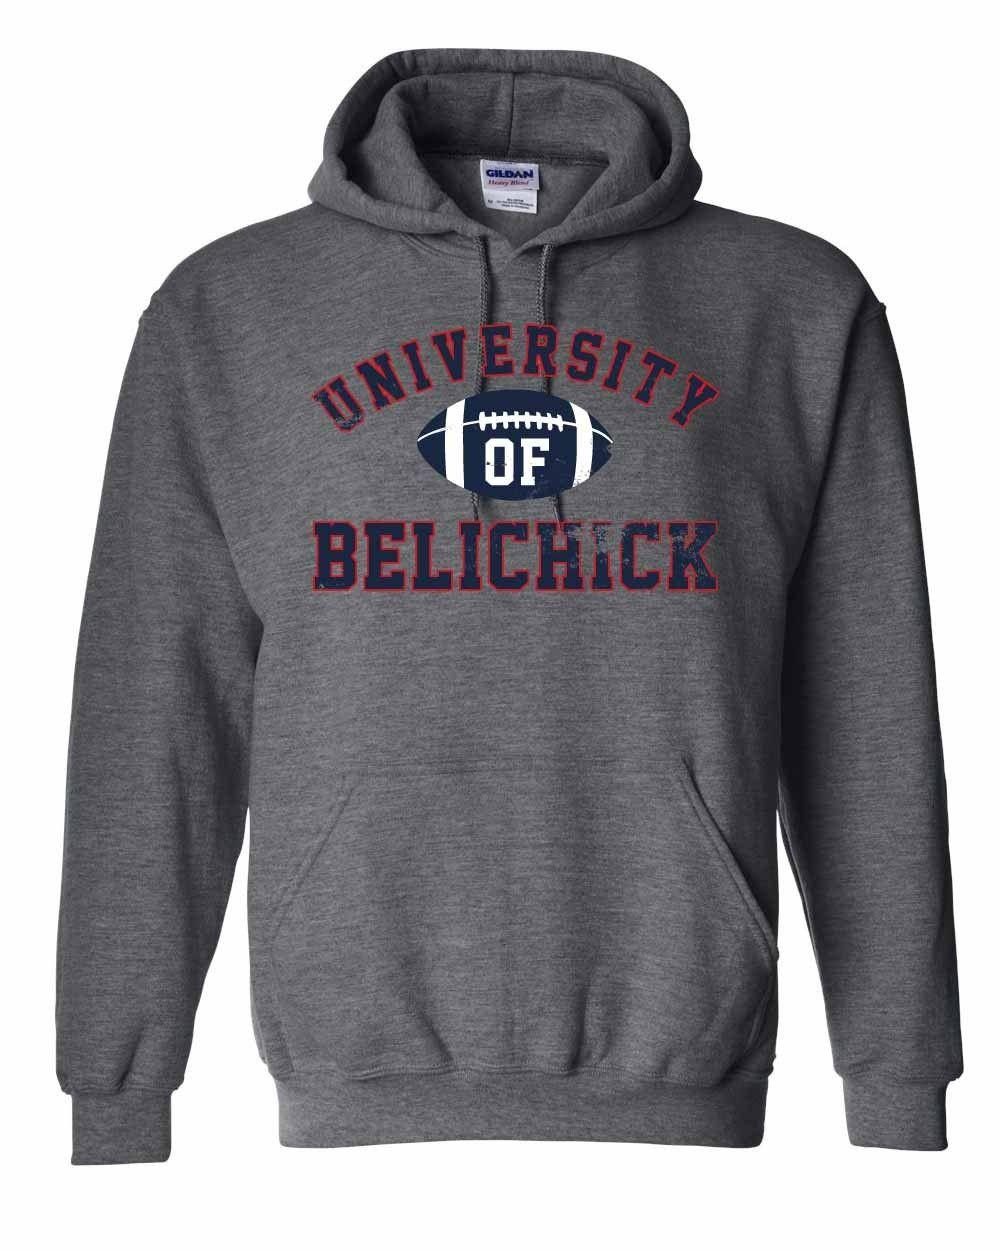 University of Belichick Sweatshirt Barstool Sports